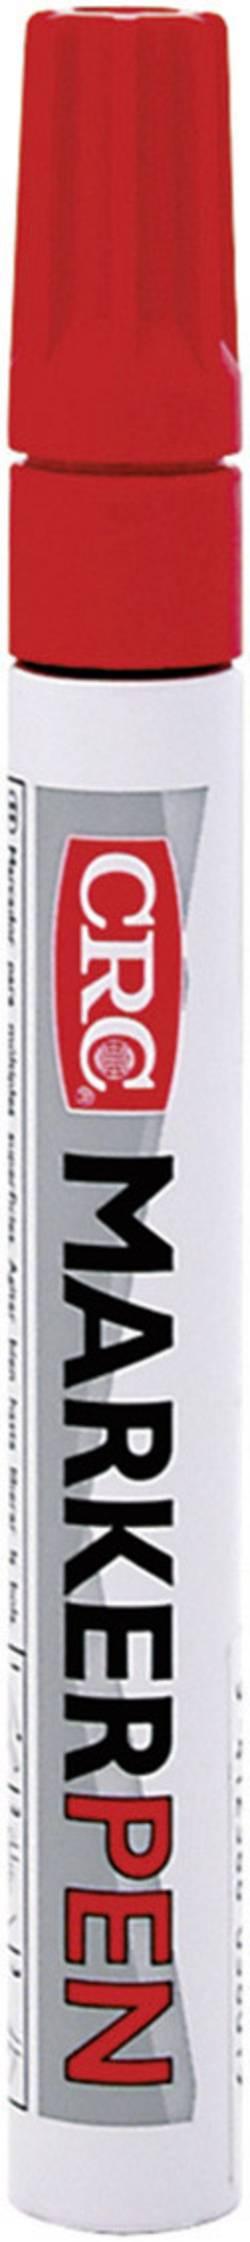 Stylo de marquage rouge signal 10 ml CRC 20388-AA